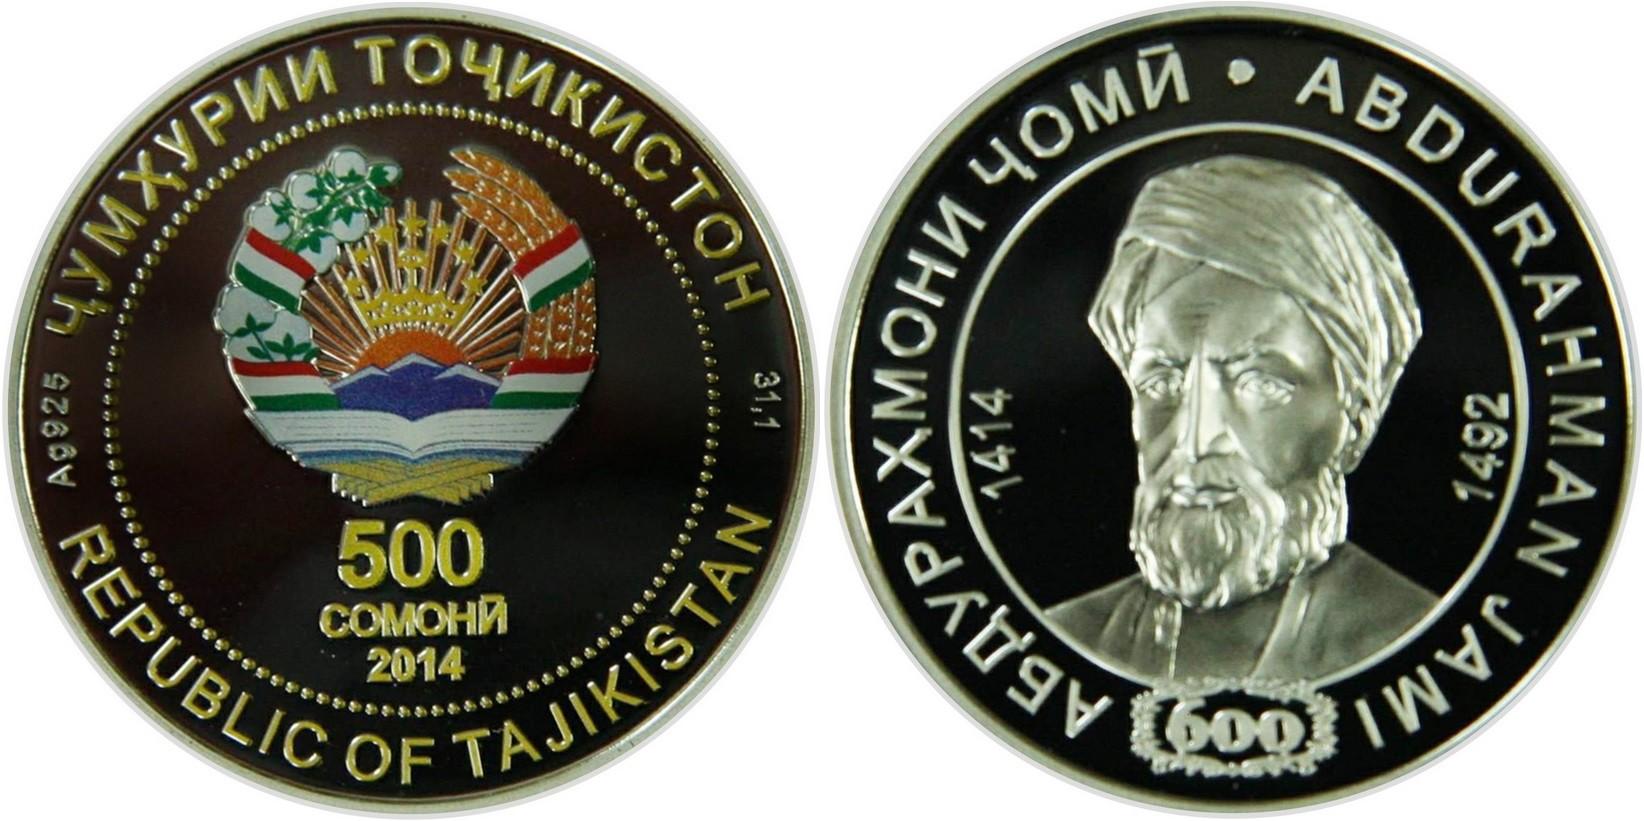 tadjikistan 2014 abdurahman jami.jpg